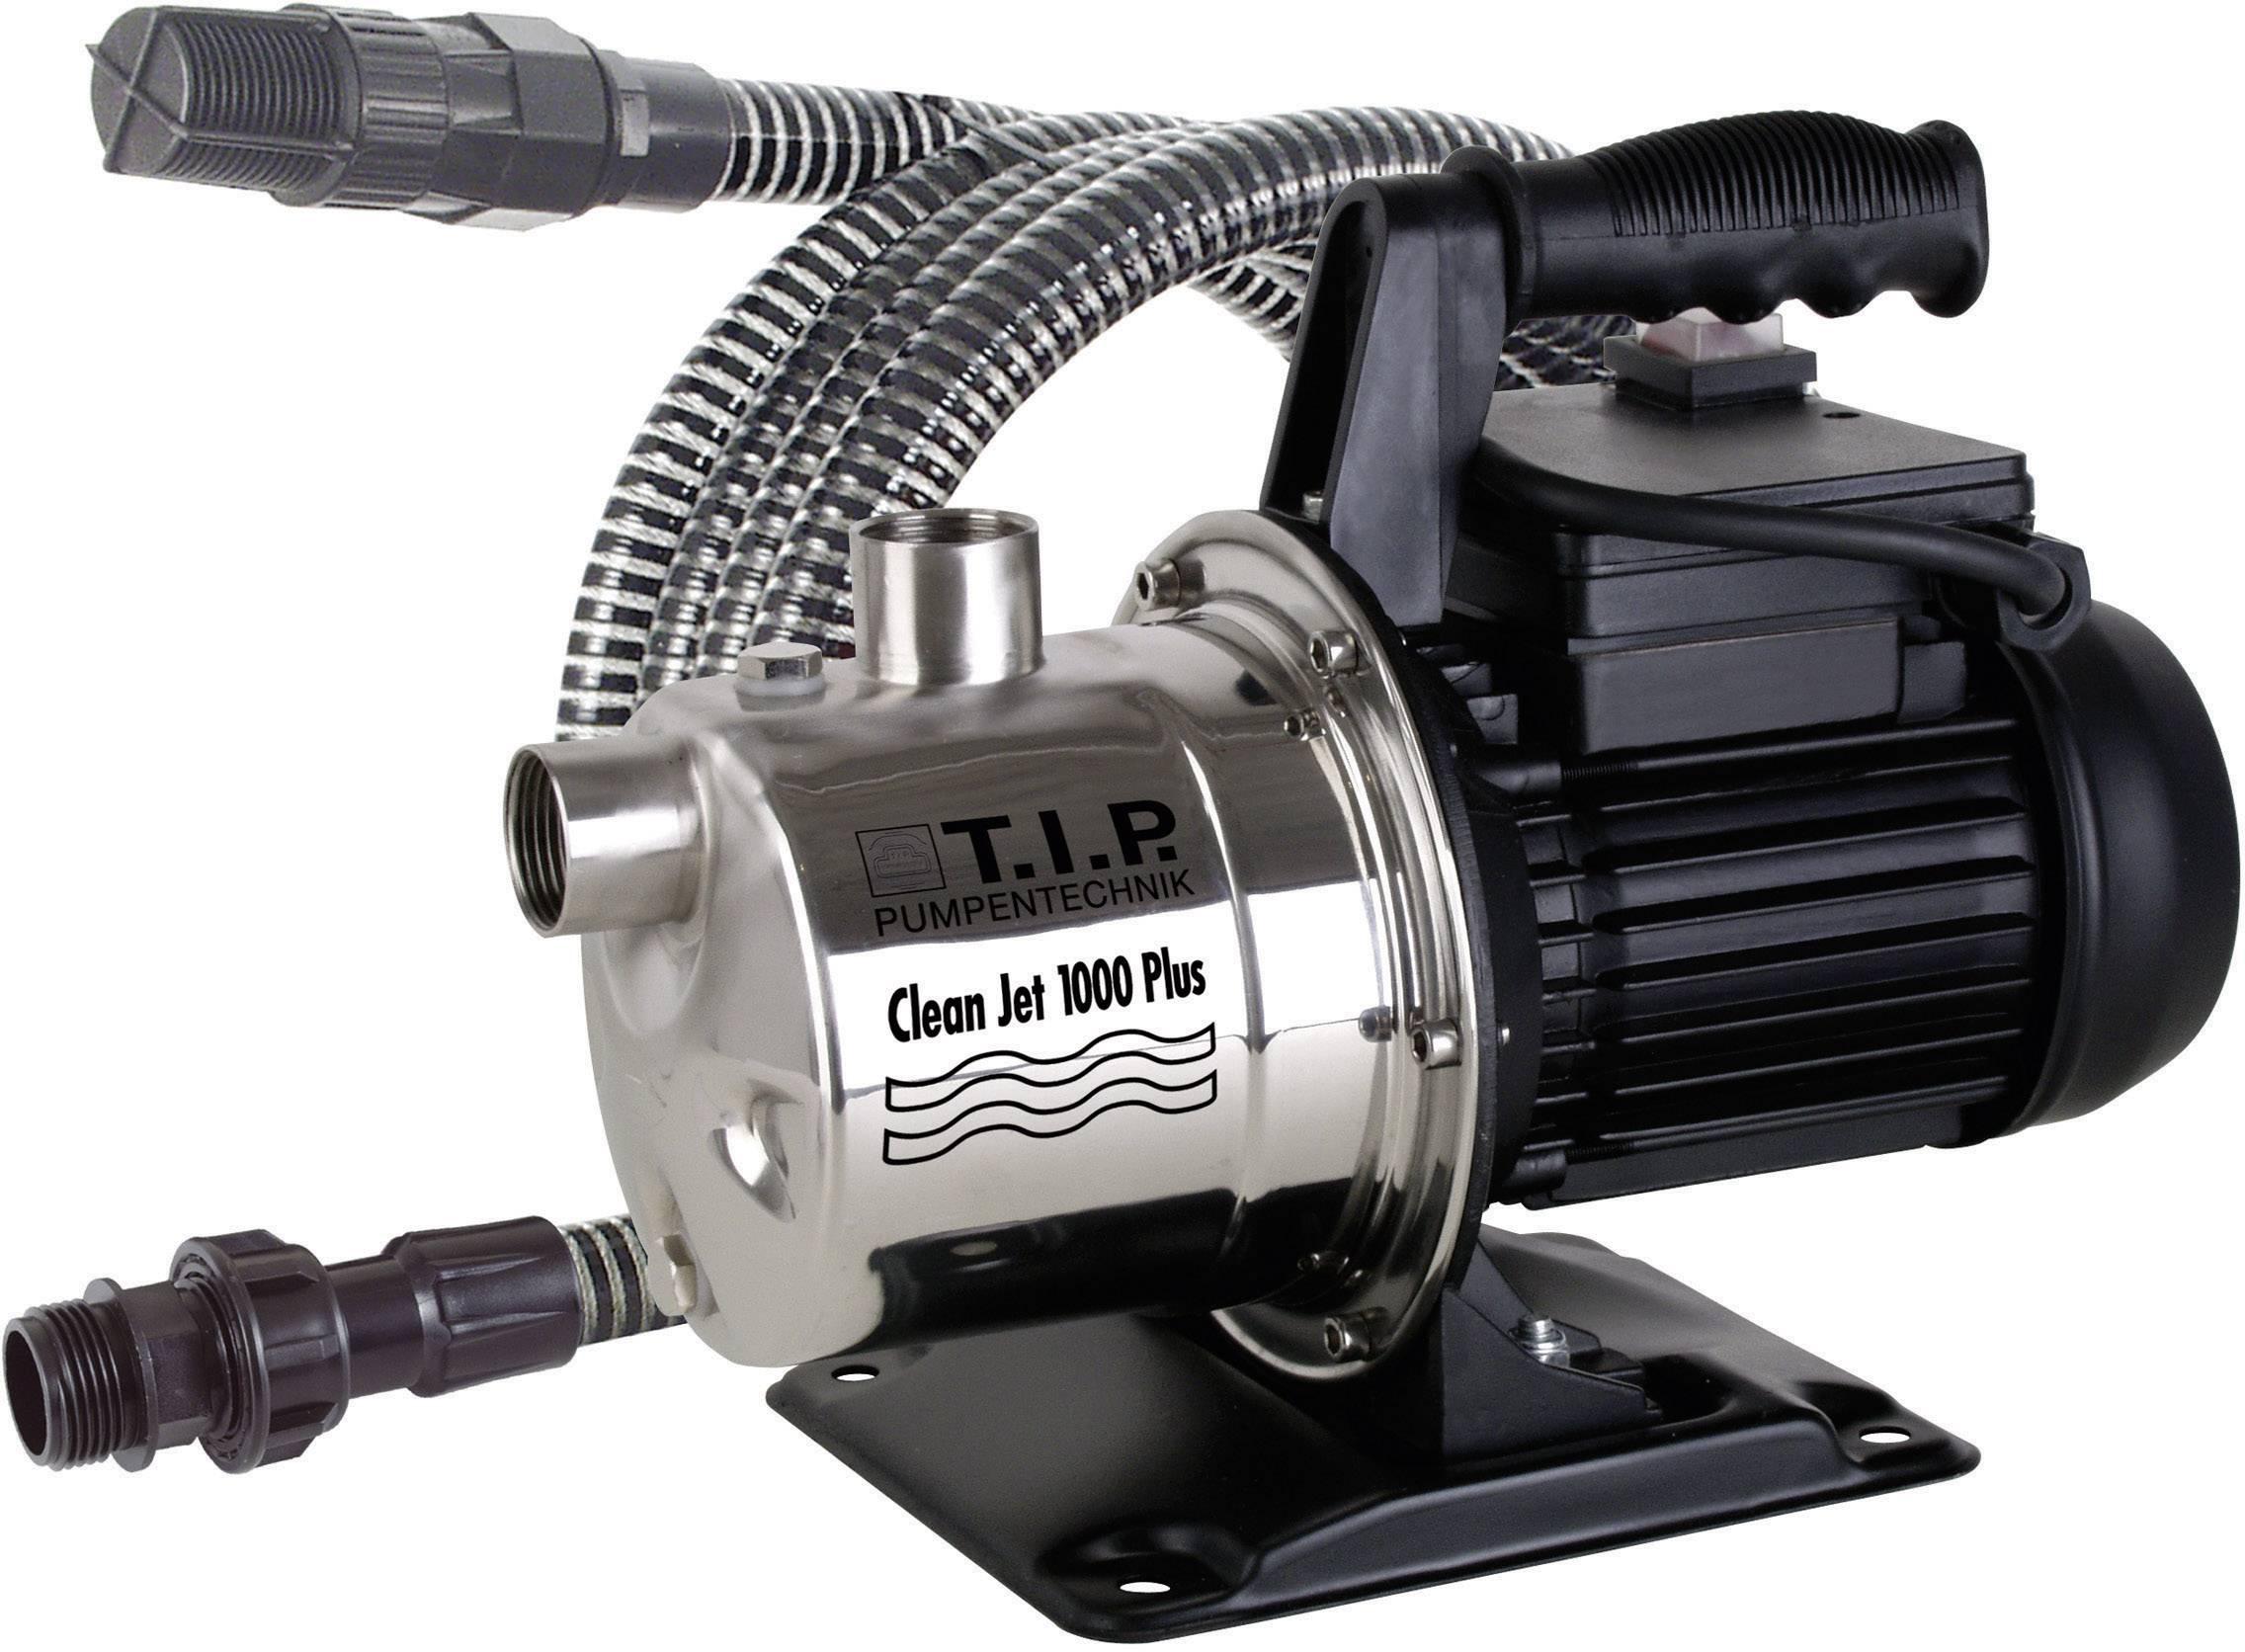 Záhradné čerpadlo T.I.P. Clean-Jet 1000 Plus, 3300 l/h, 46 m, 800 W